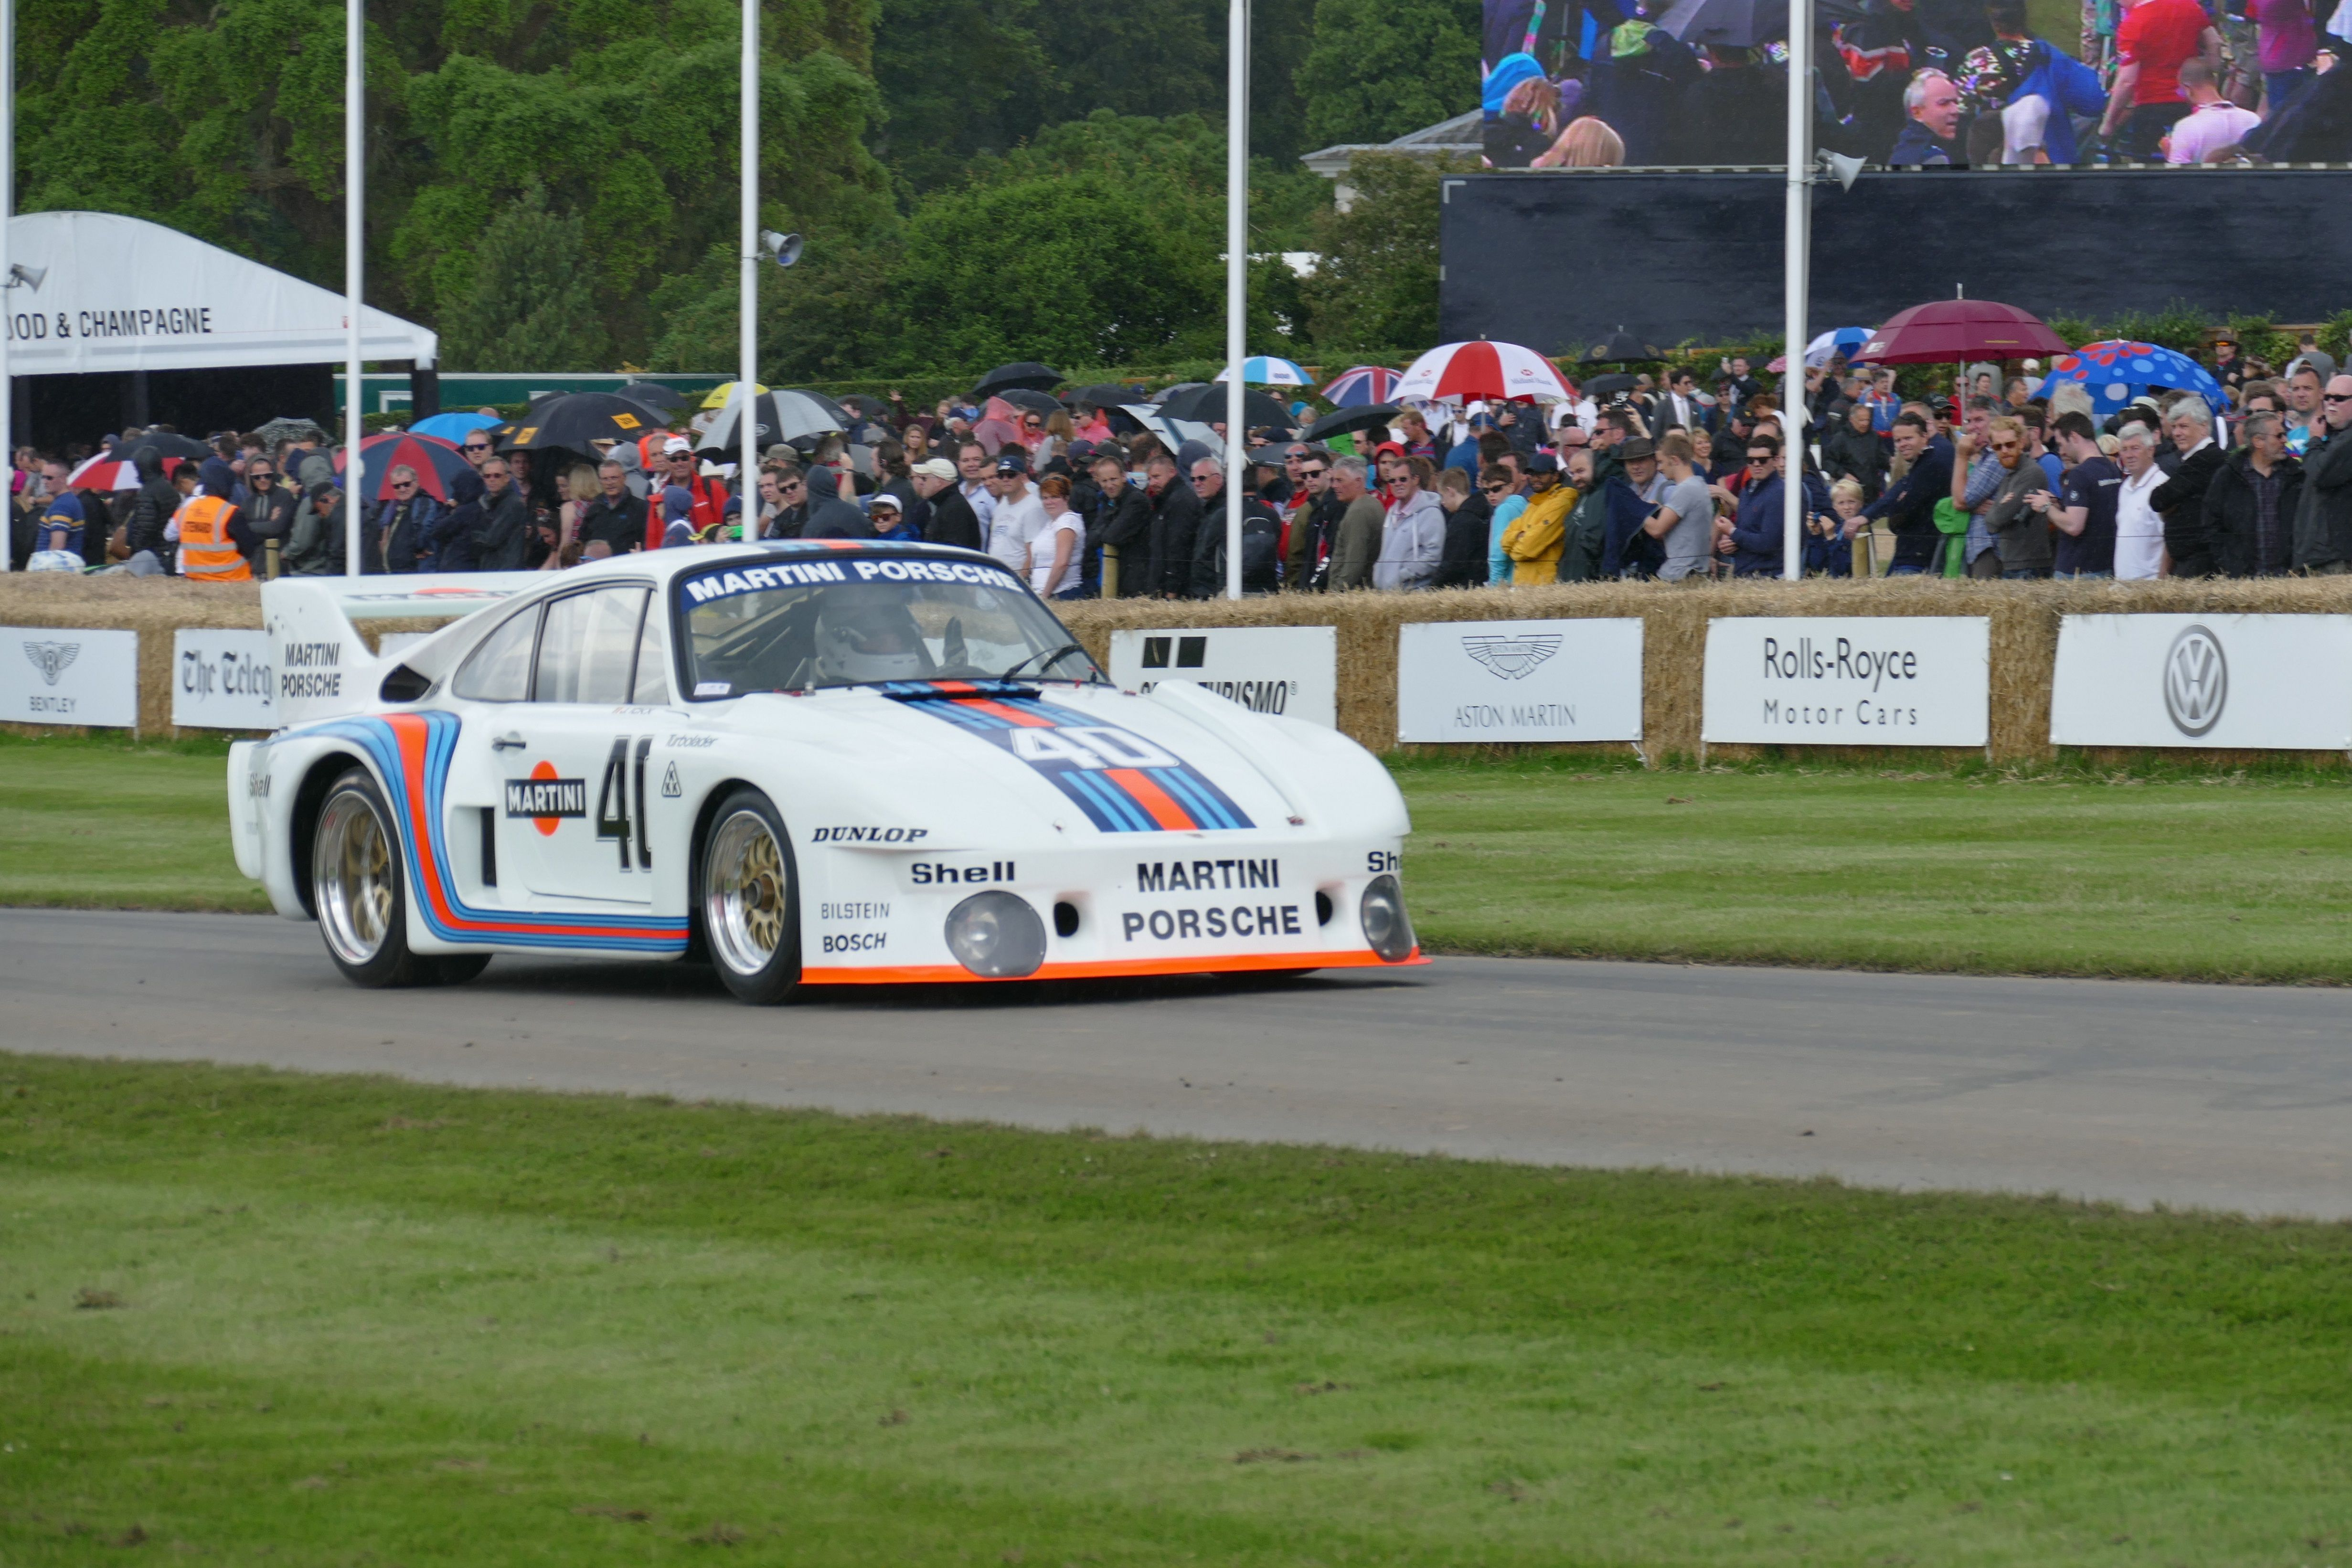 #FOS #Goodwood #FOS2016 Goodwood Festival of Speed #Porsche #911RSR #MartiniRacing Martini Racing #911